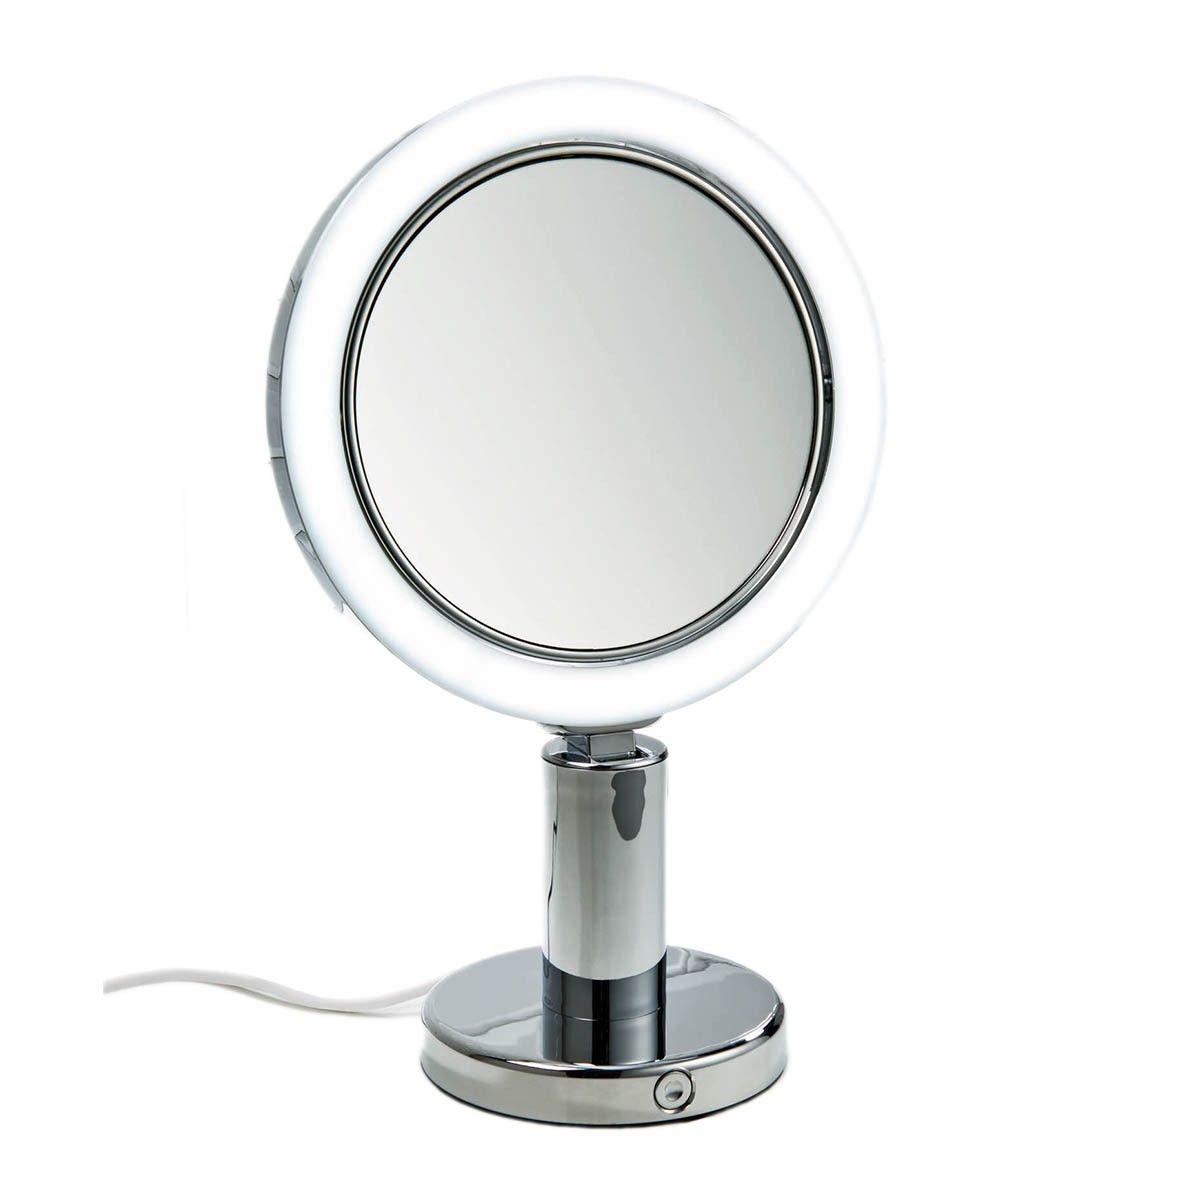 Smile 301 Magnifying Mirror Illuminated 7x Cosmetic Mirror